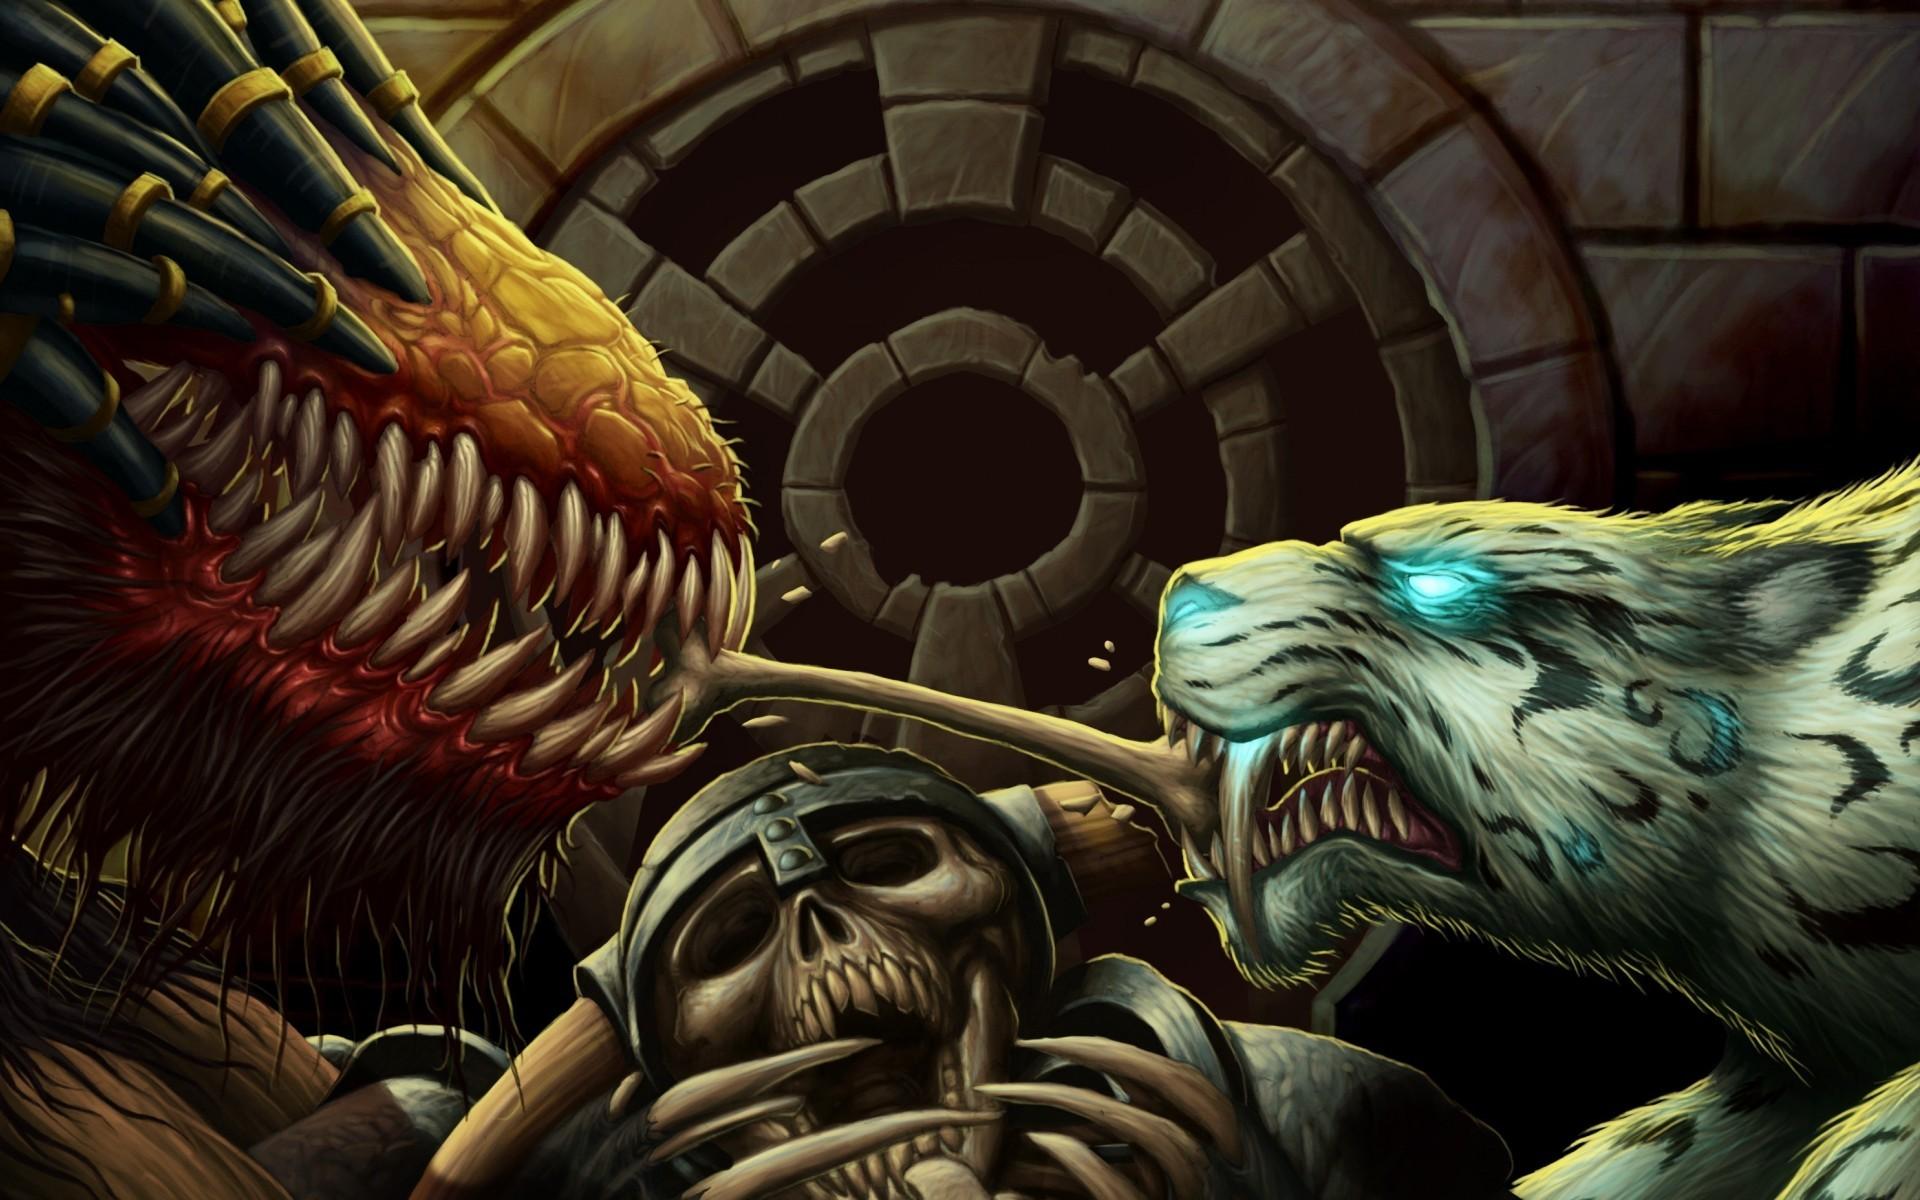 Fantasy monster creature tiger dragon wallpaper     28558    WallpaperUP